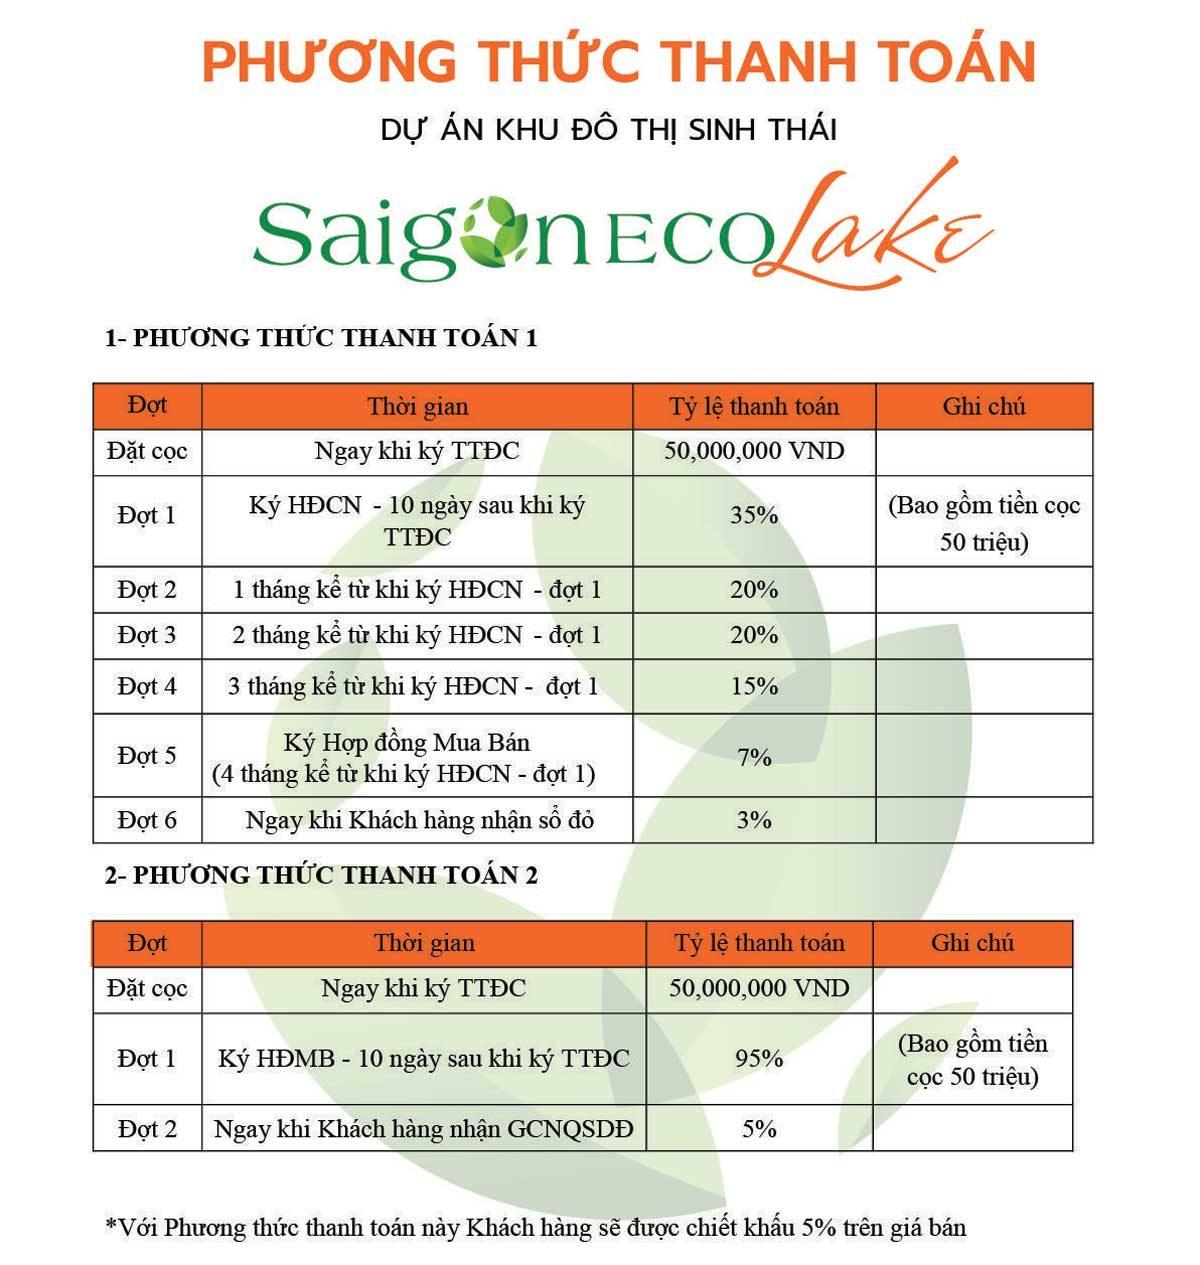 phuong-thuc-thanh-toan-du-an-saigon-eco-lake